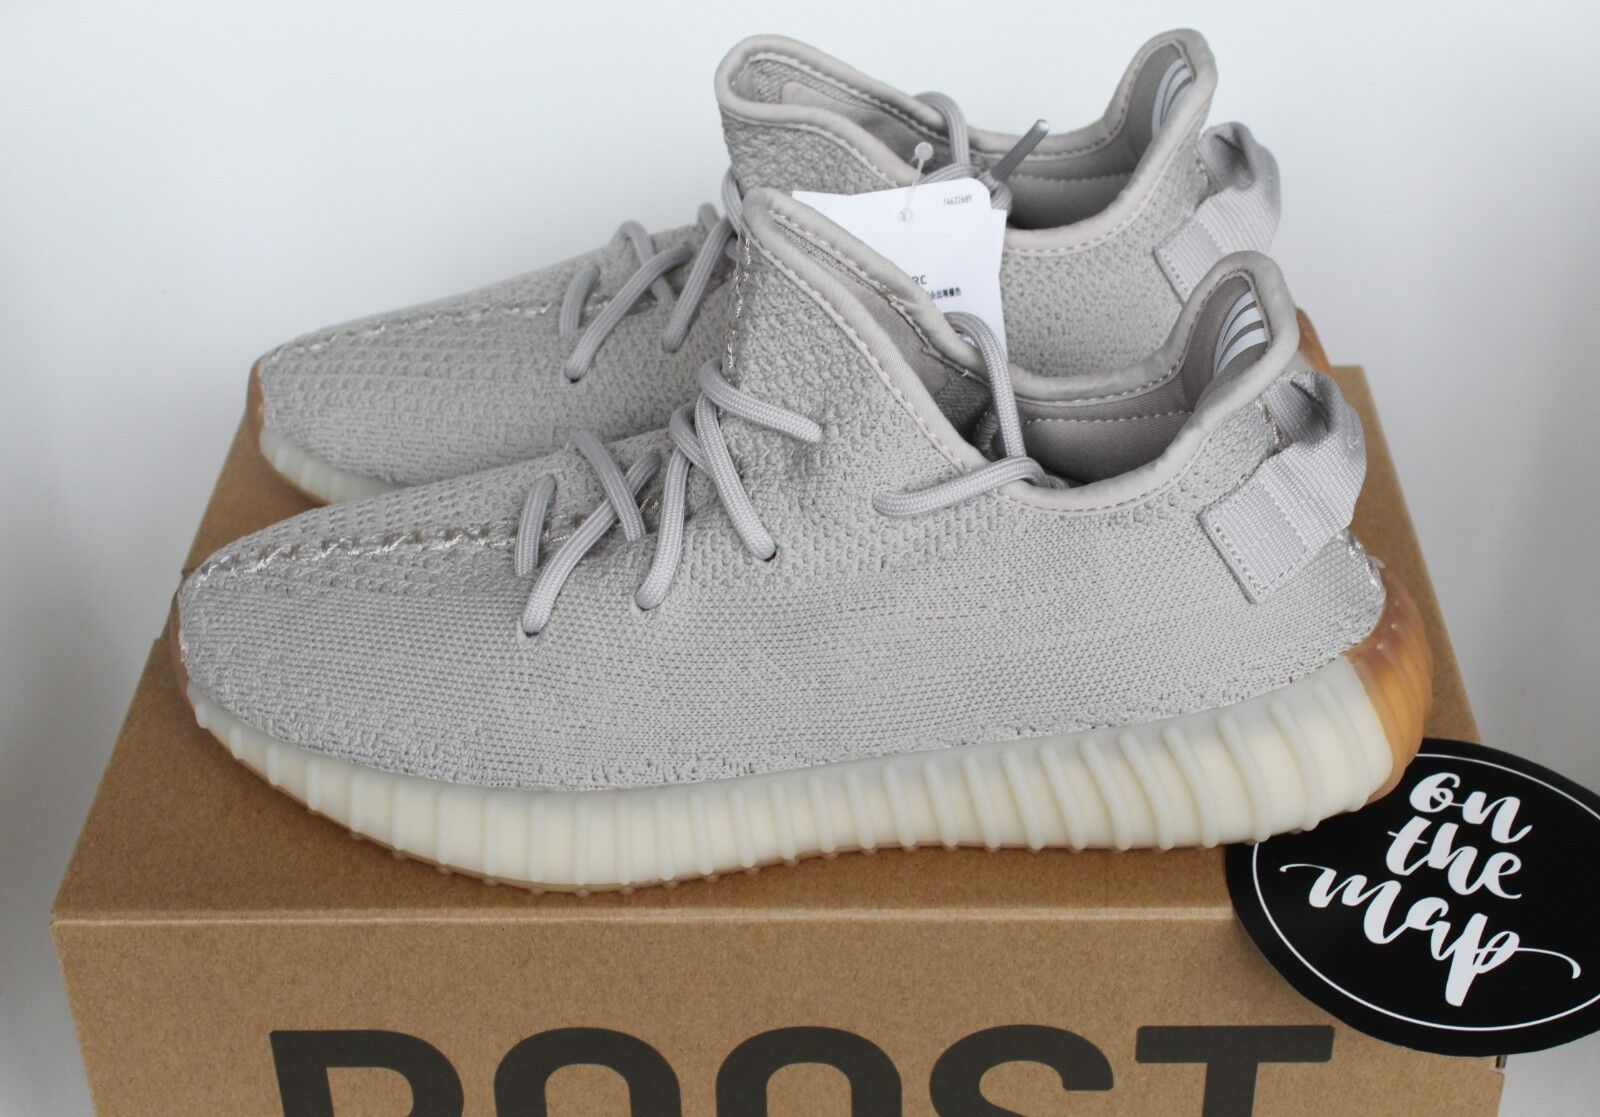 Adidas Yeezy Boost 350 V2 Sesame Grey Tan Beige US New